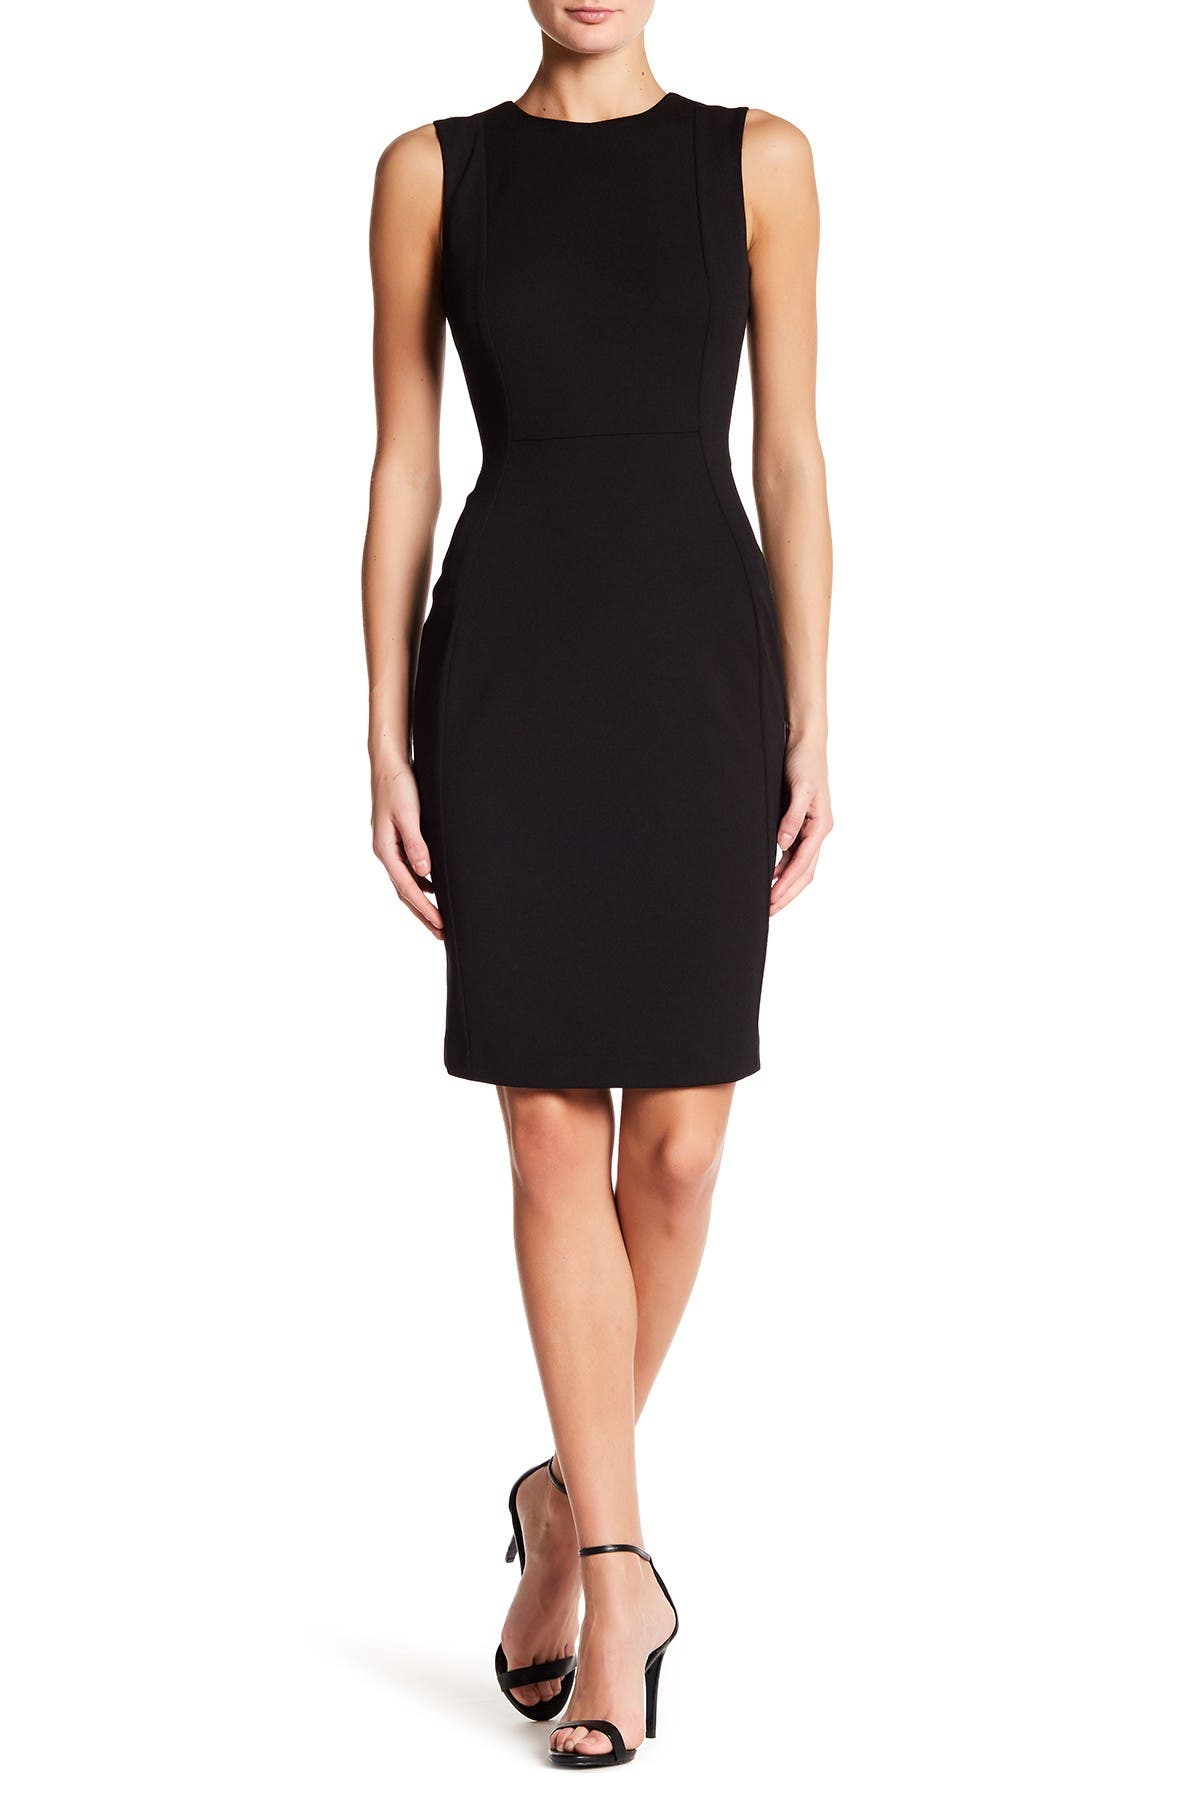 Image of Calvin Klein Solid Scuba Crepe Sheath Dress